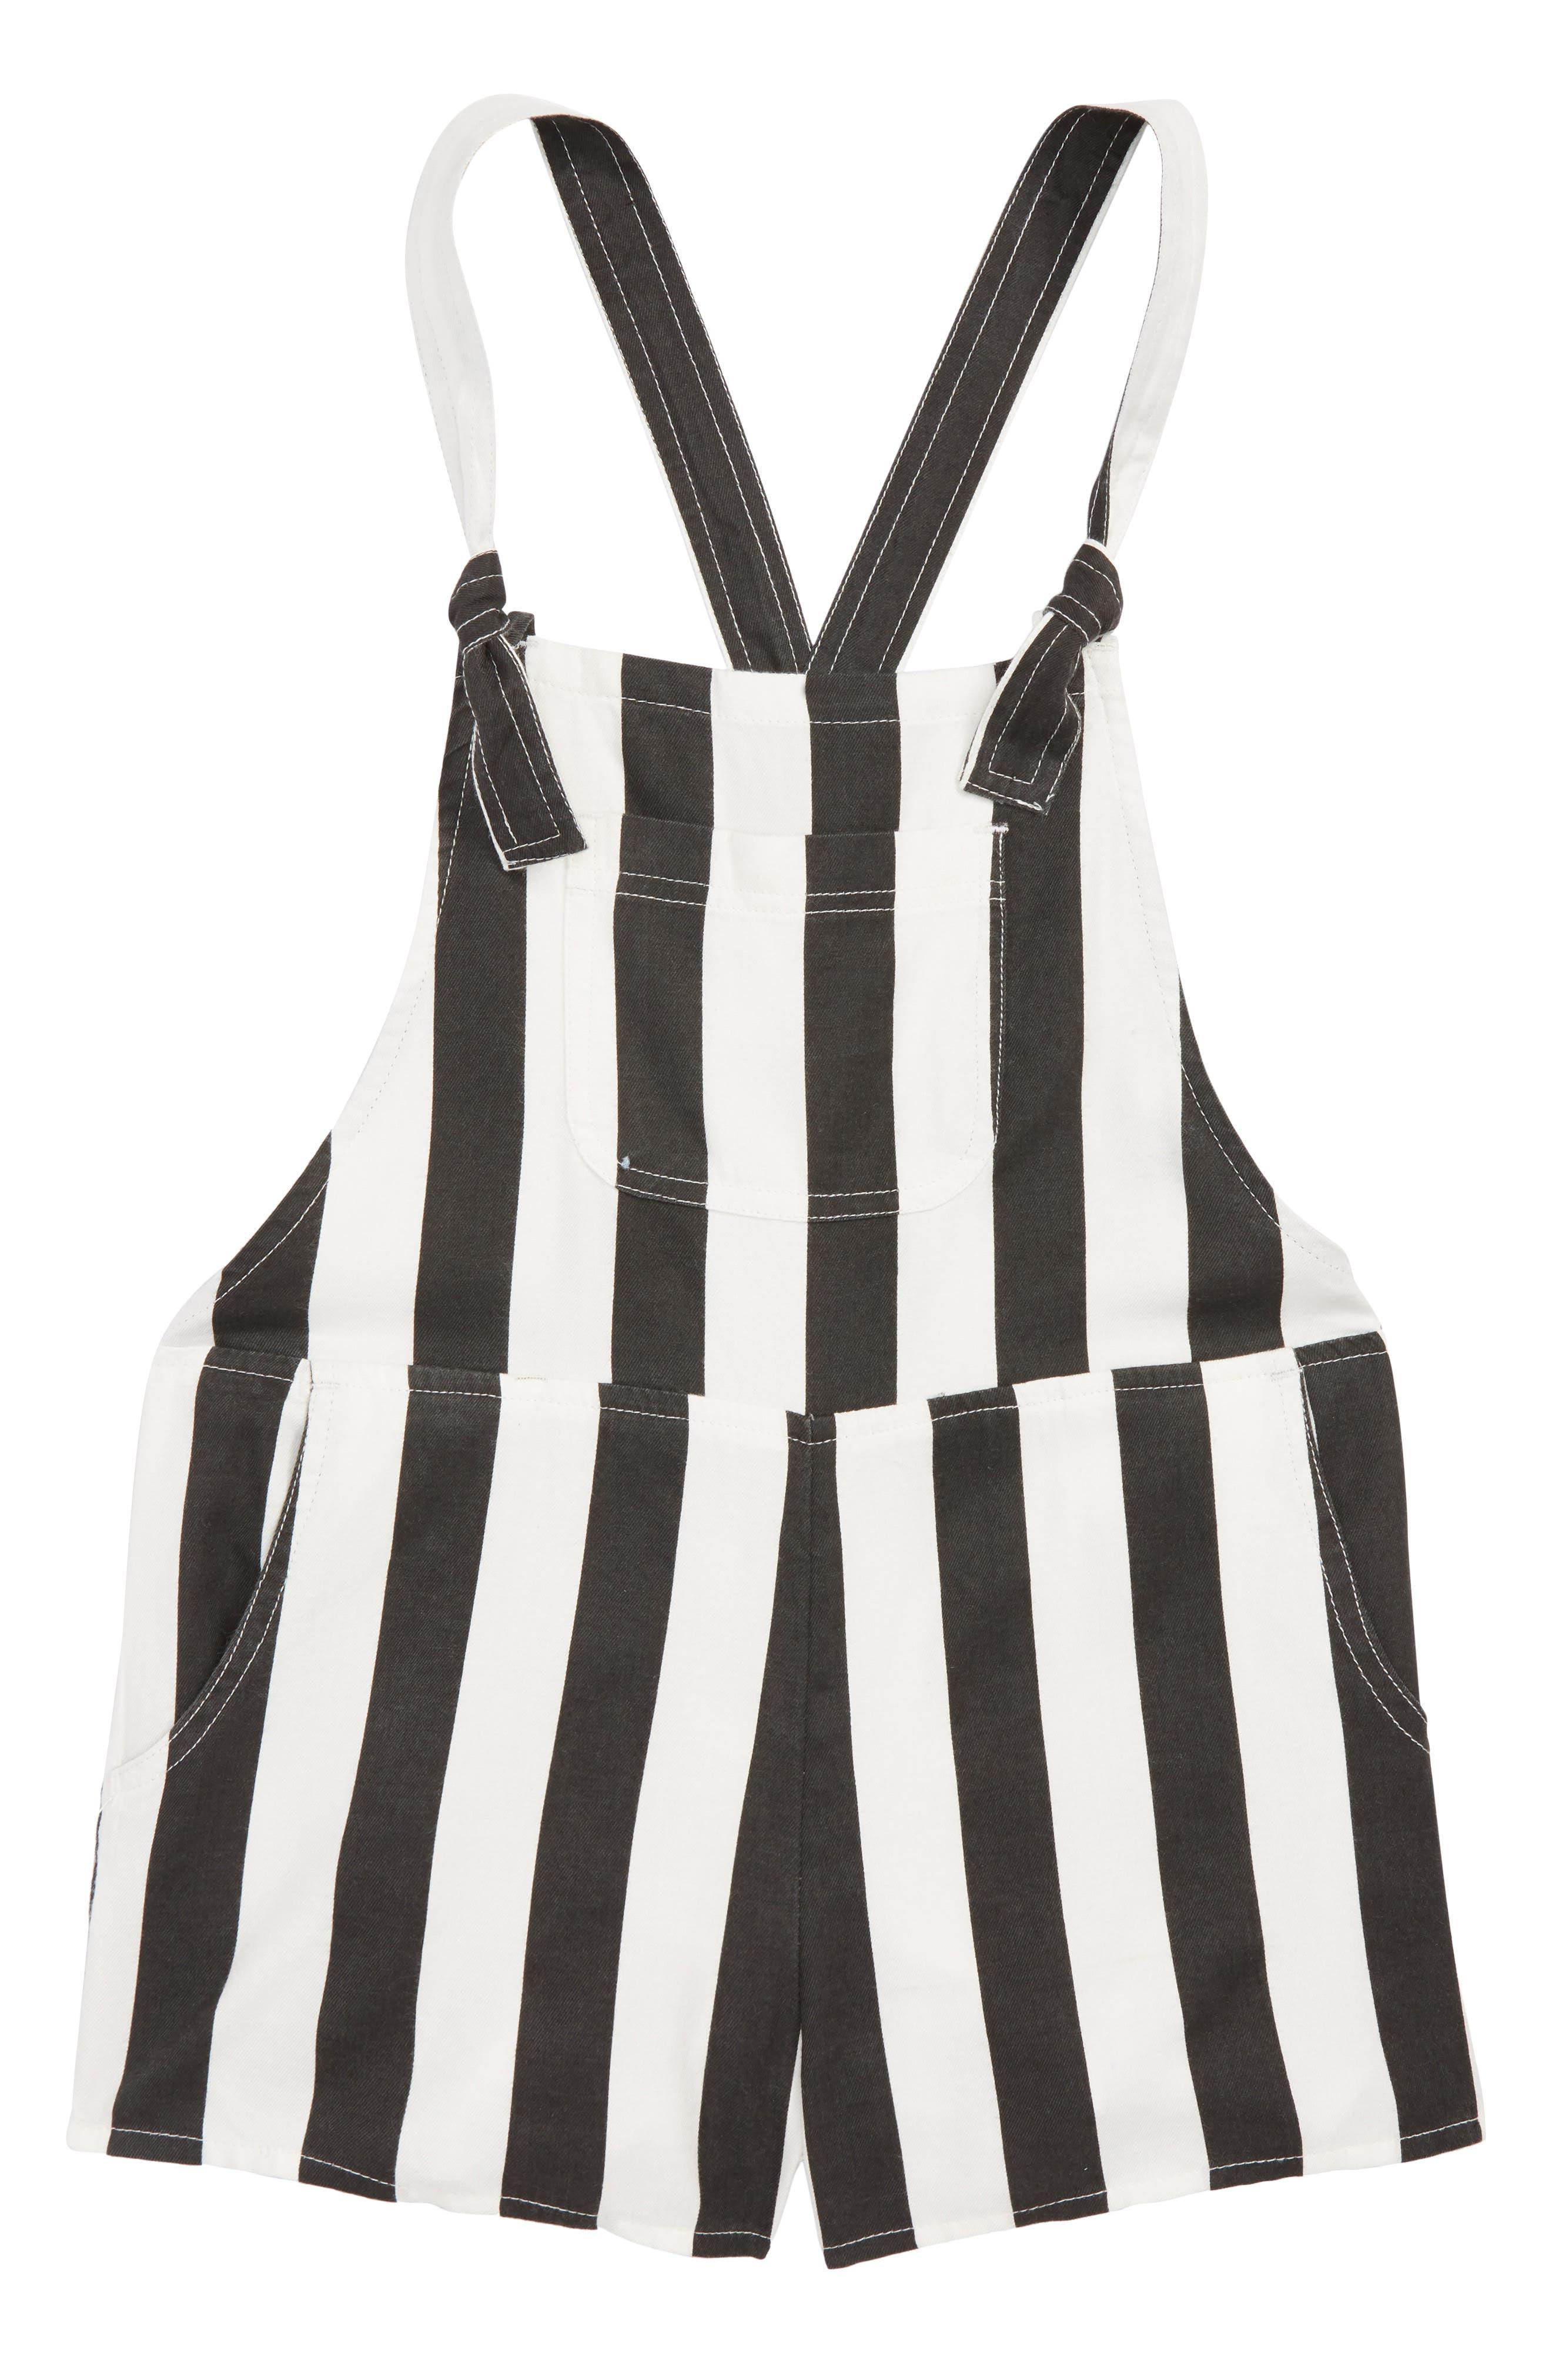 Roamin Stripe Short Overalls,                         Main,                         color, Black